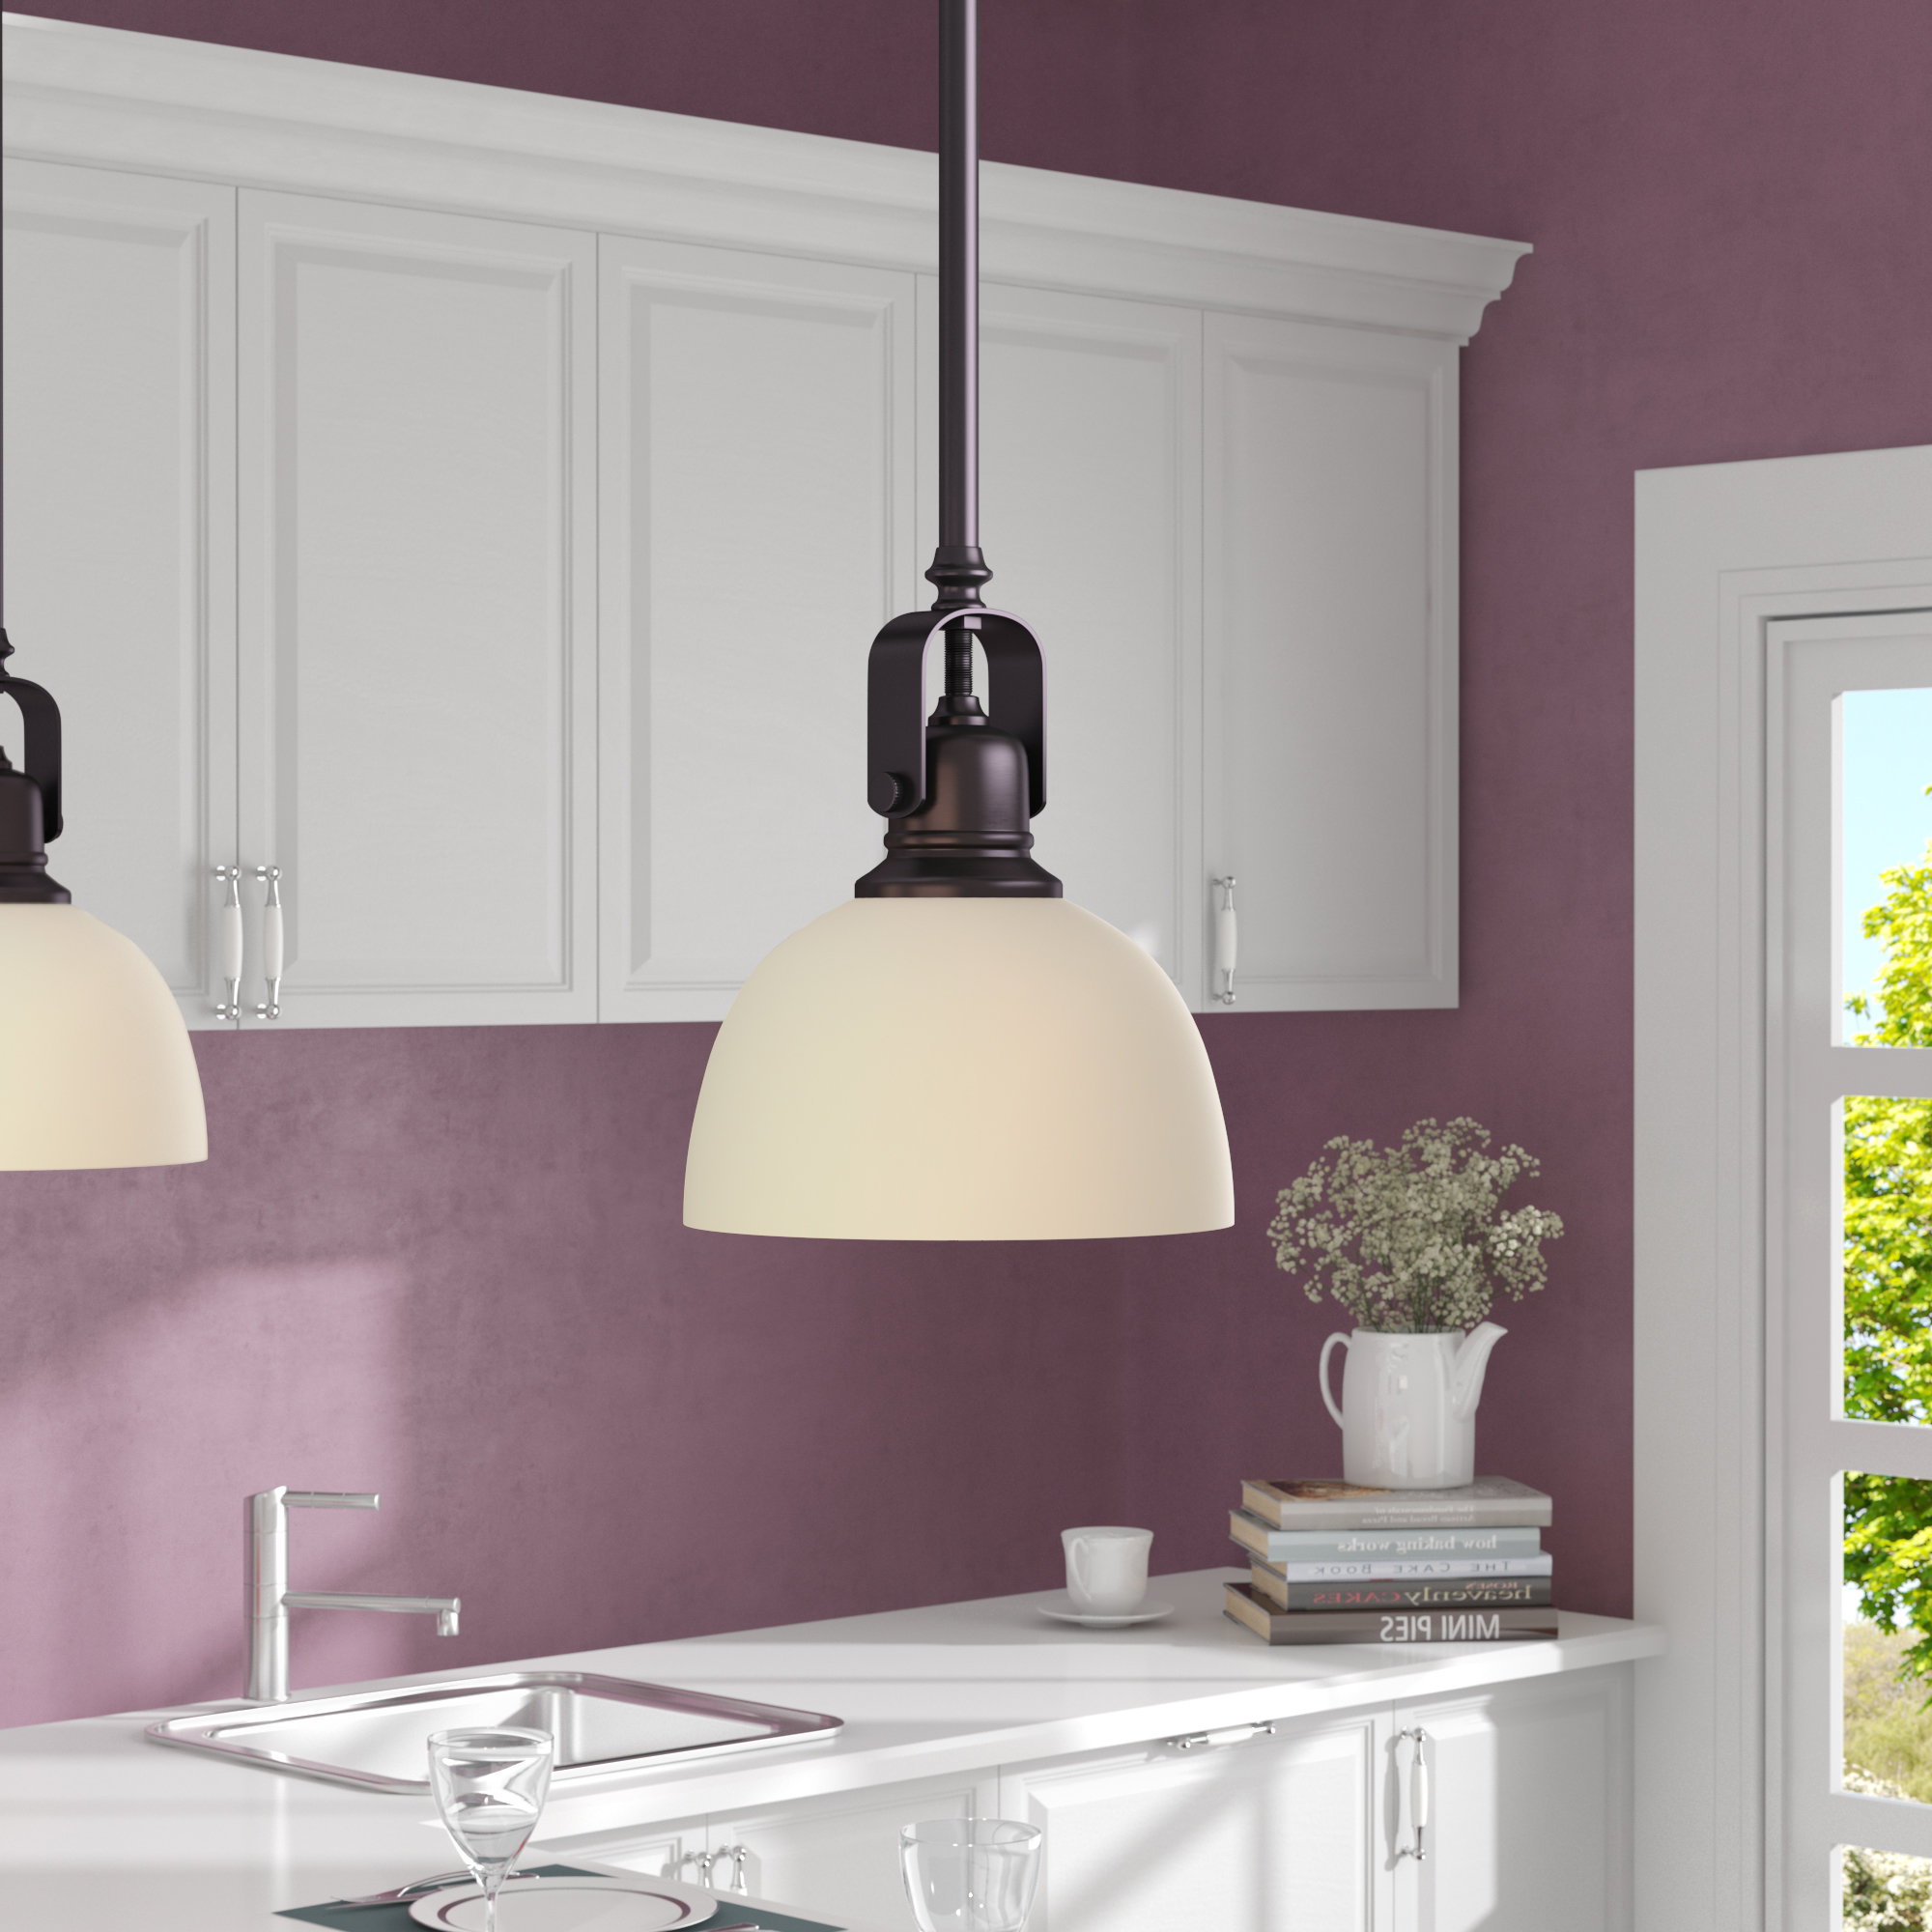 Featured Photo of Abernathy 1 Light Dome Pendants